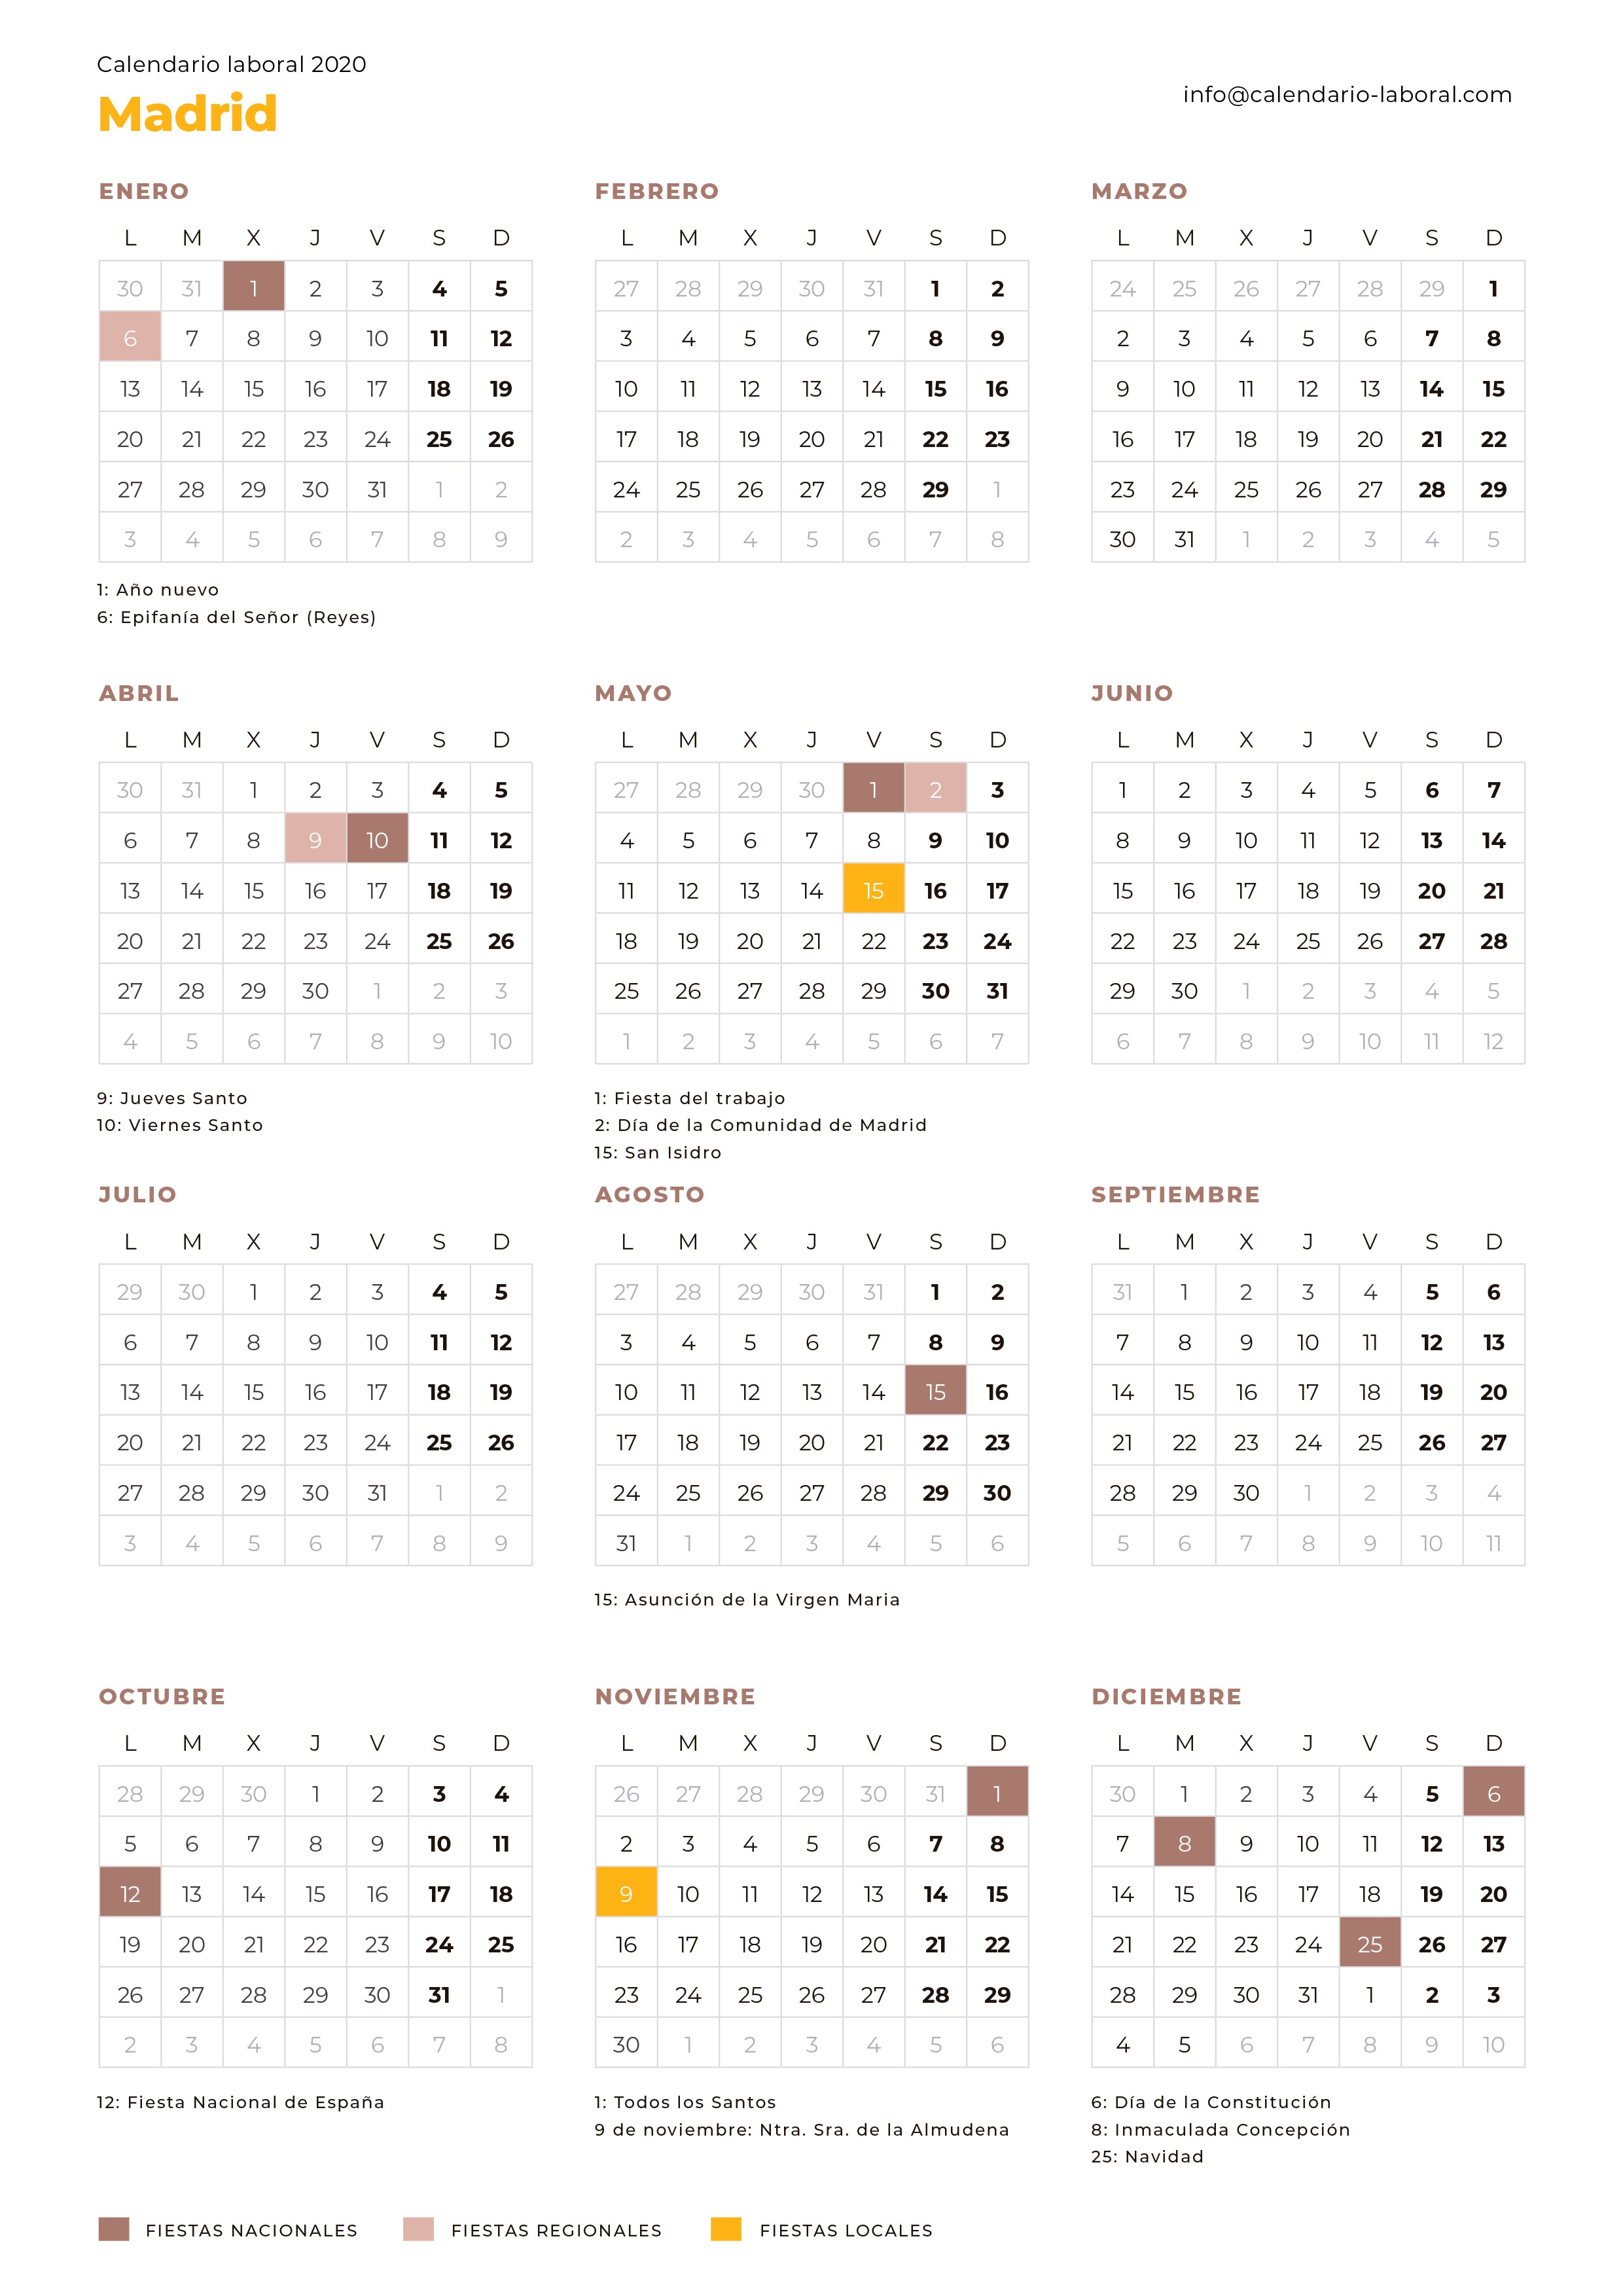 Calendario Oficial De Feriados 2020 Más Actual Uso Inv Of Calendario Oficial De Feriados 2020 Más Populares Calaméo Diario De Noticias De lava